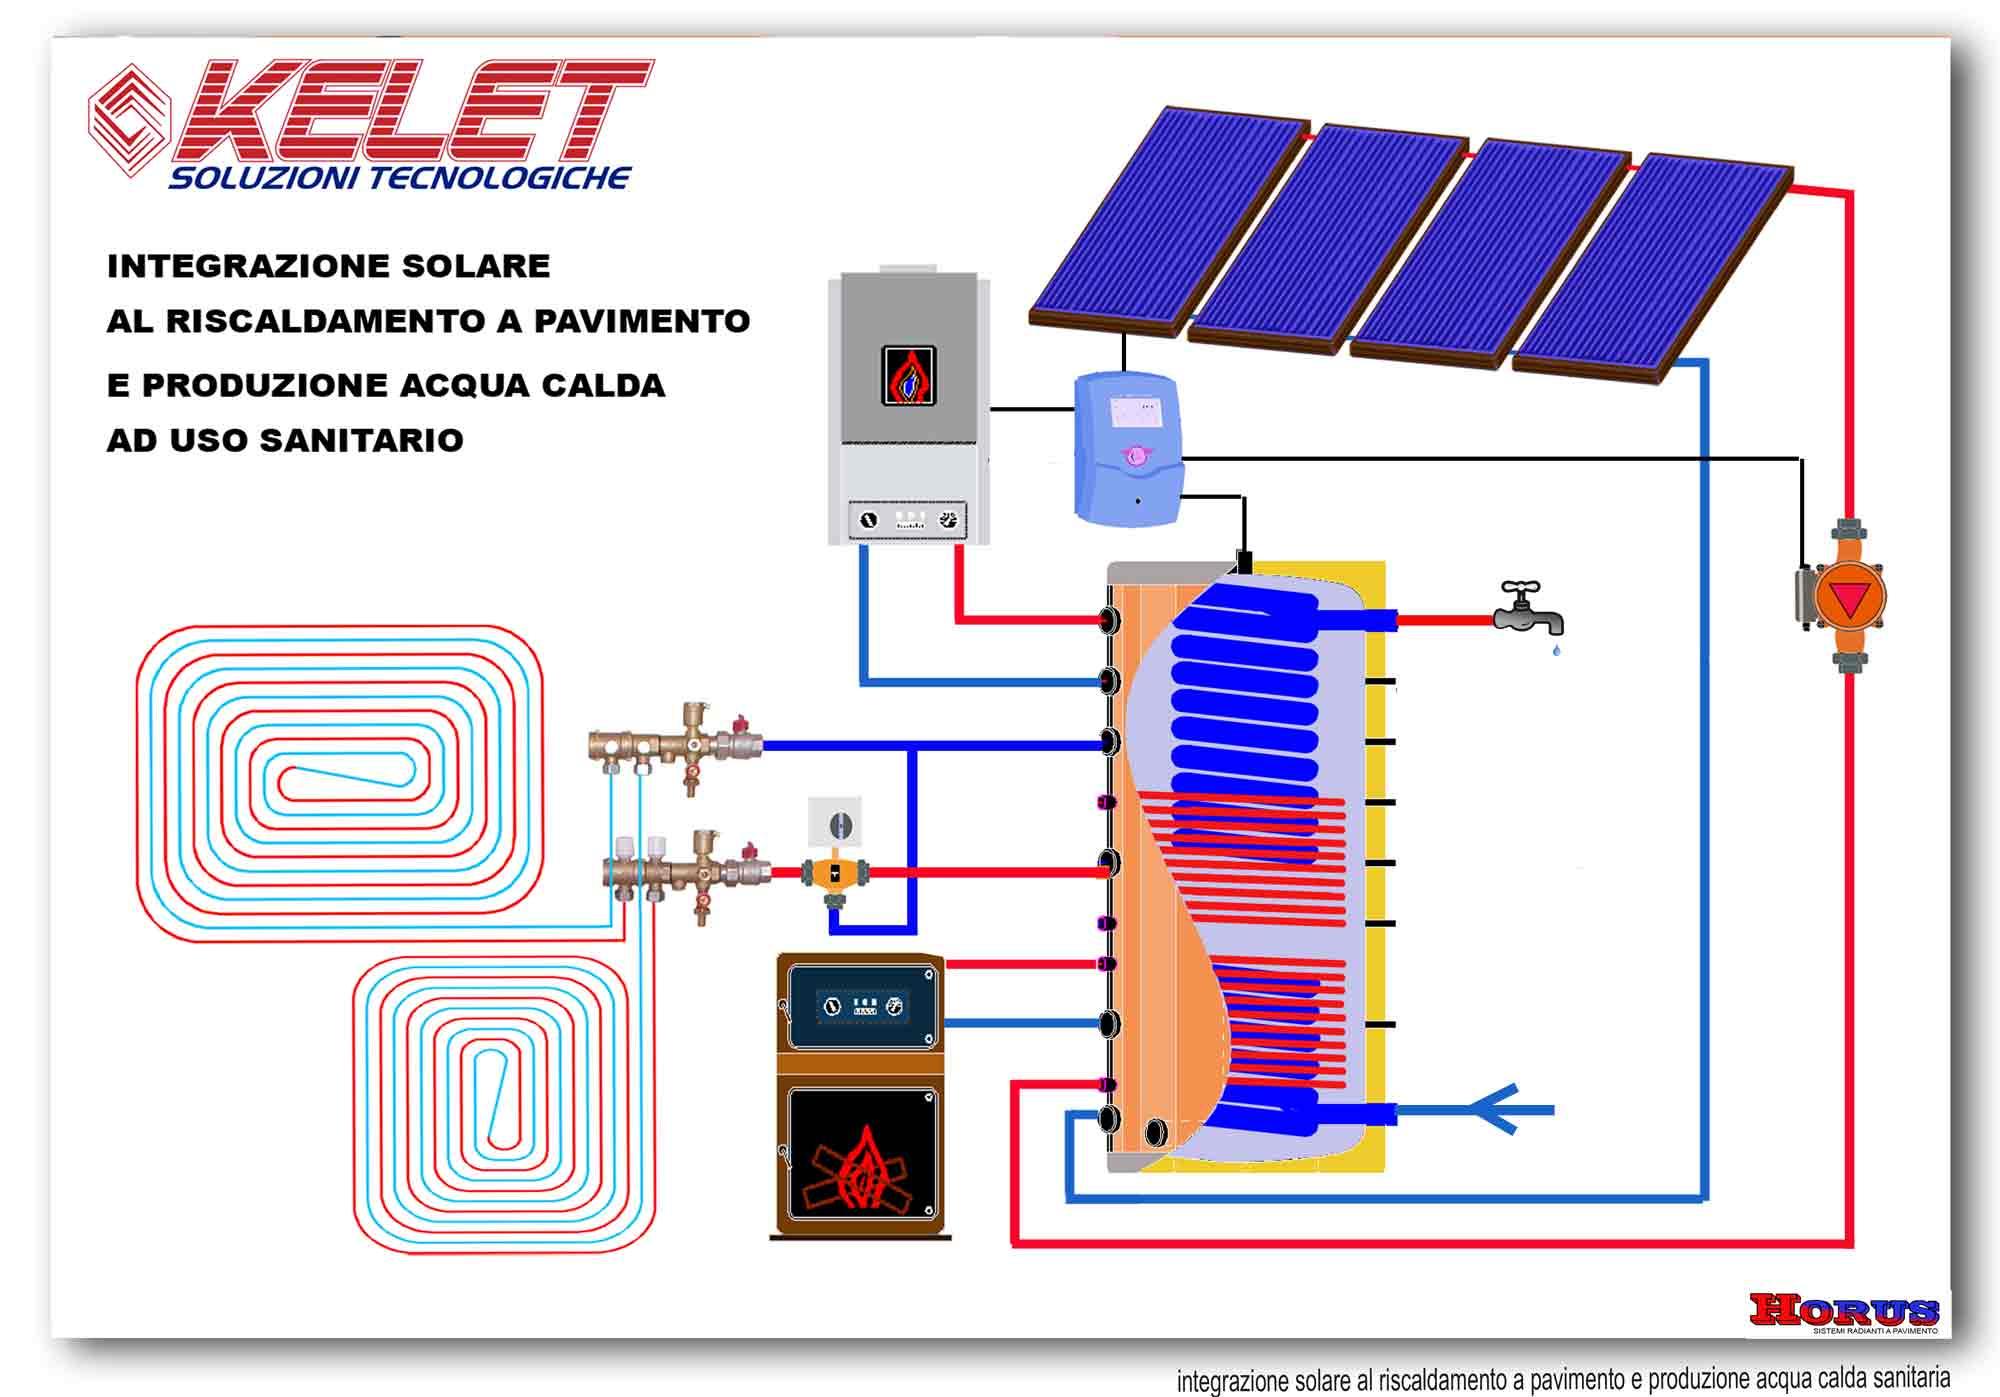 Pannello Solare Con Riscaldamento A Pavimento : Pannelli solari casa solare termico riscaldamento a pavimento